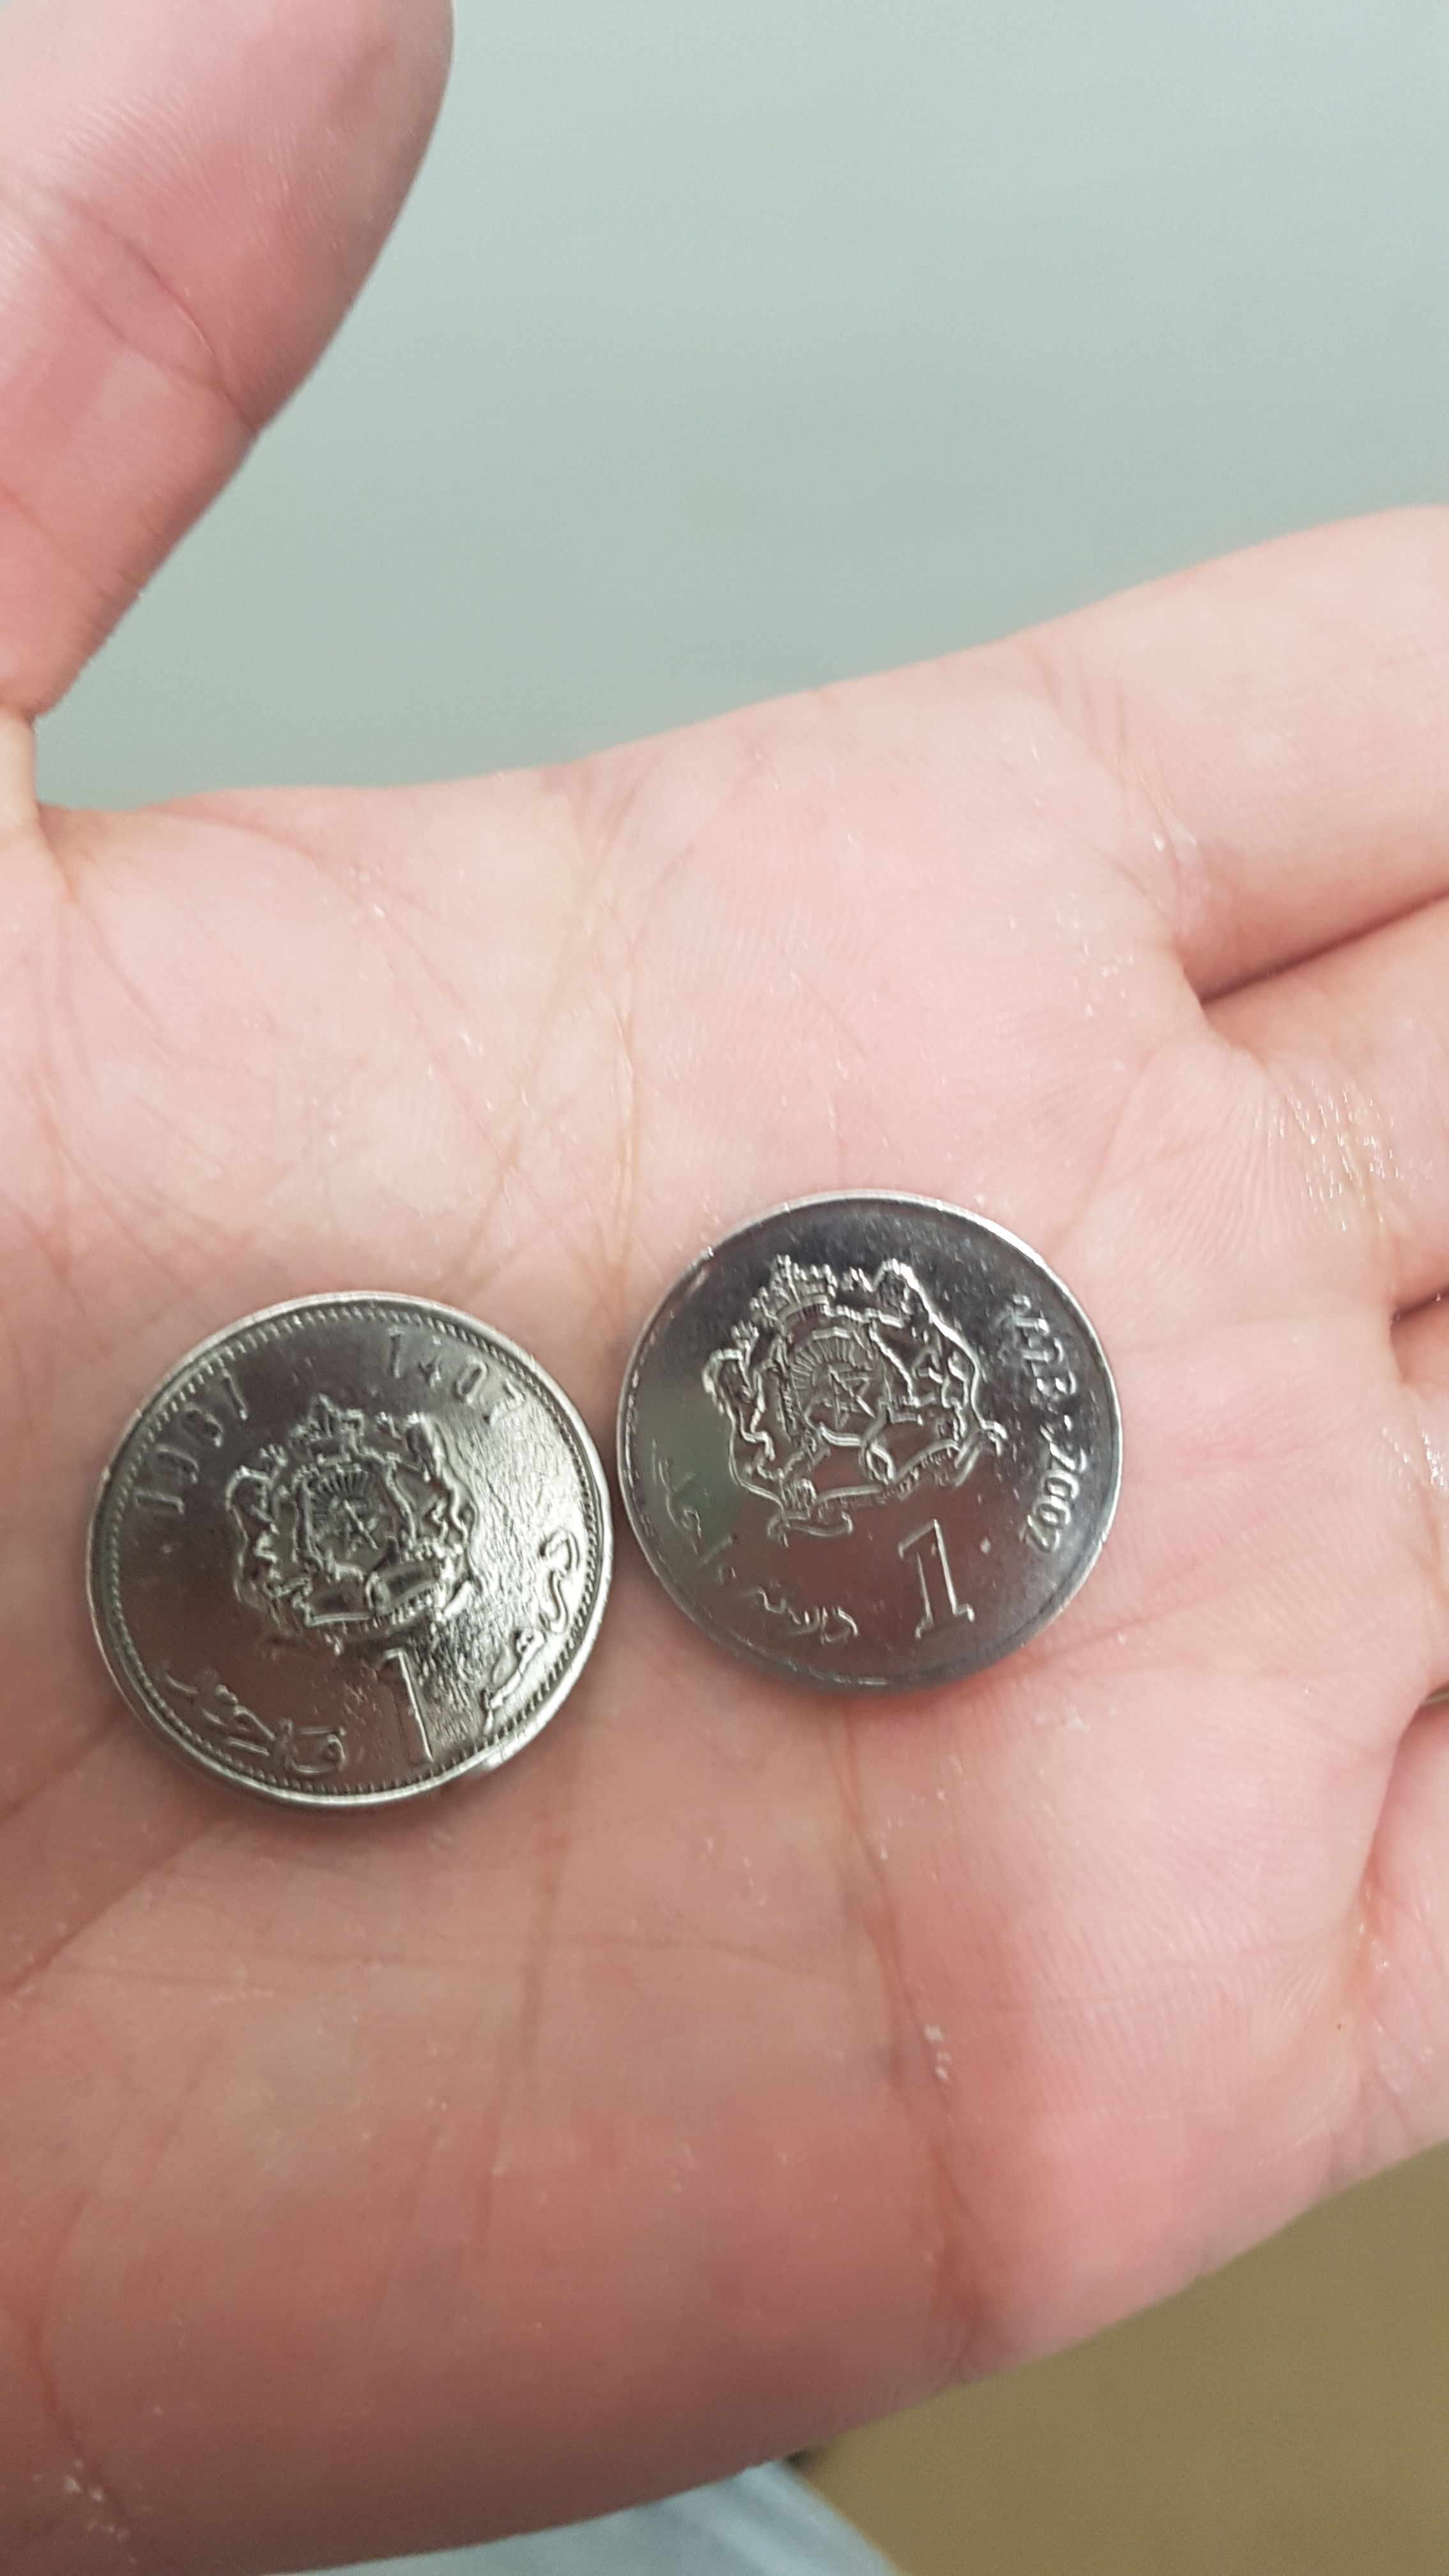 Refurbishing Old Coins